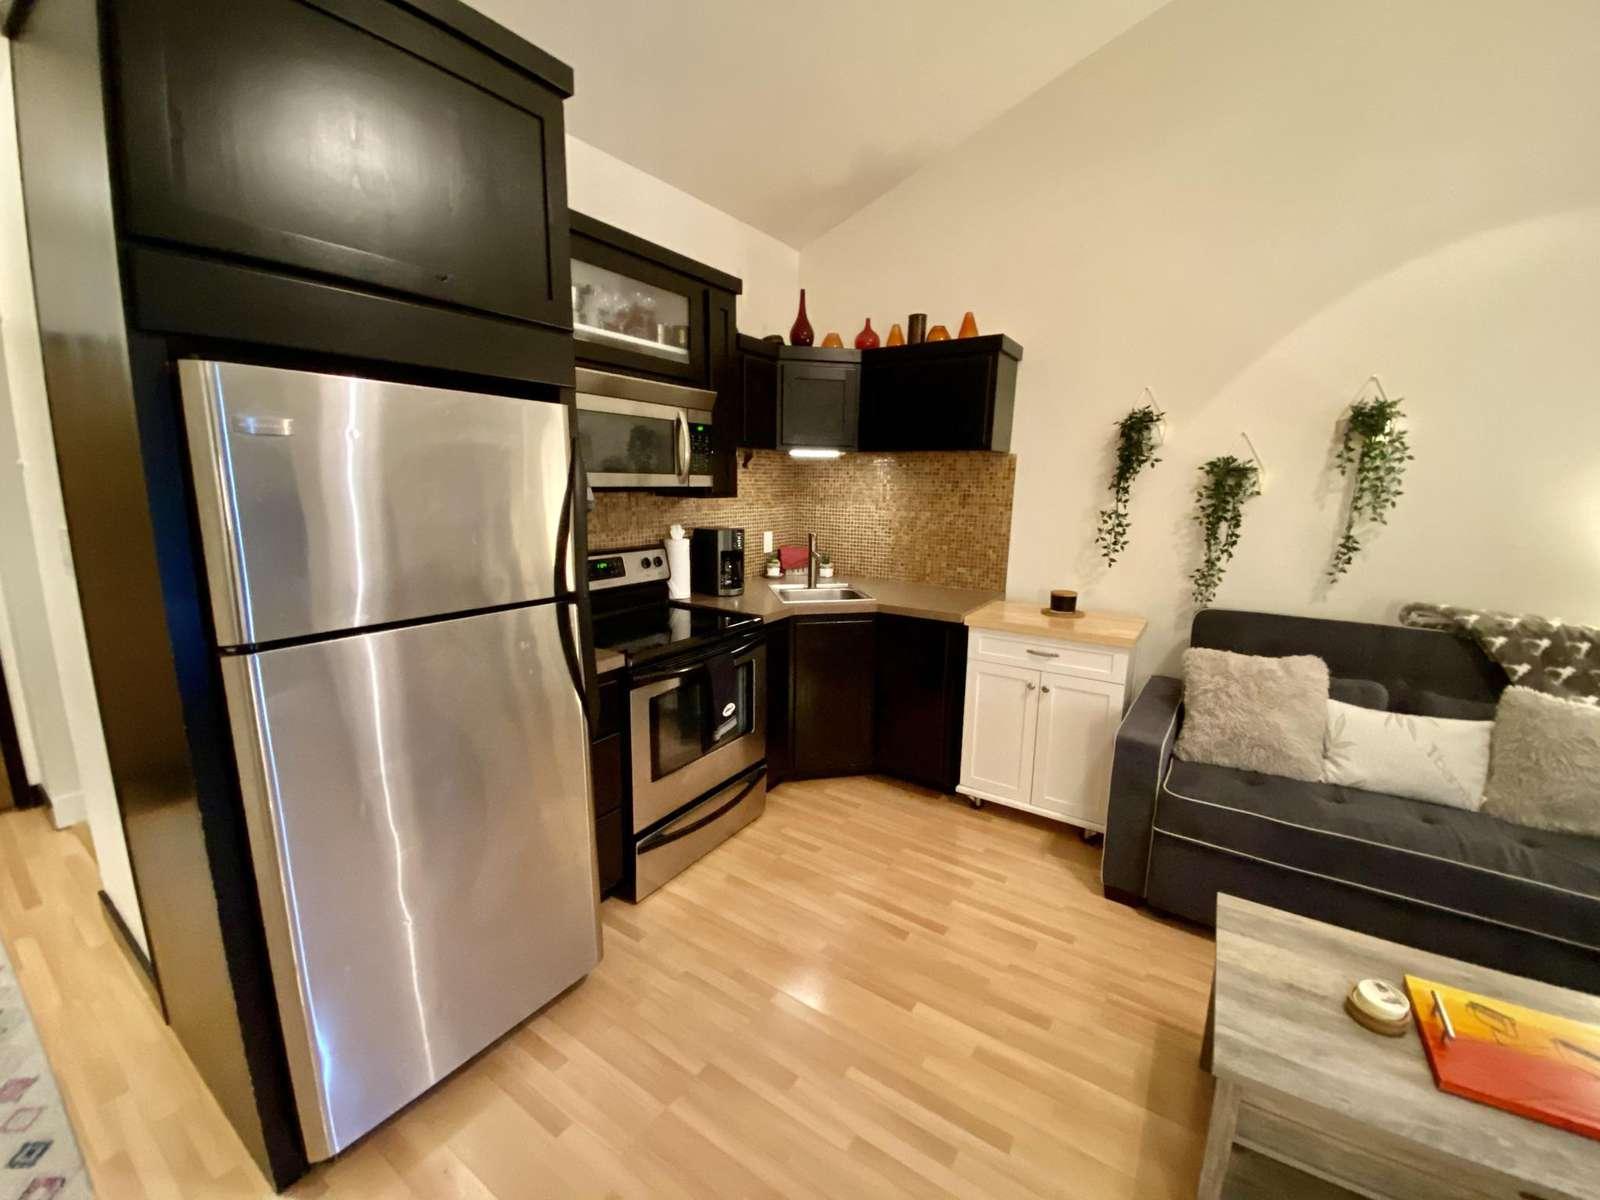 Full fridge to store food for long stays